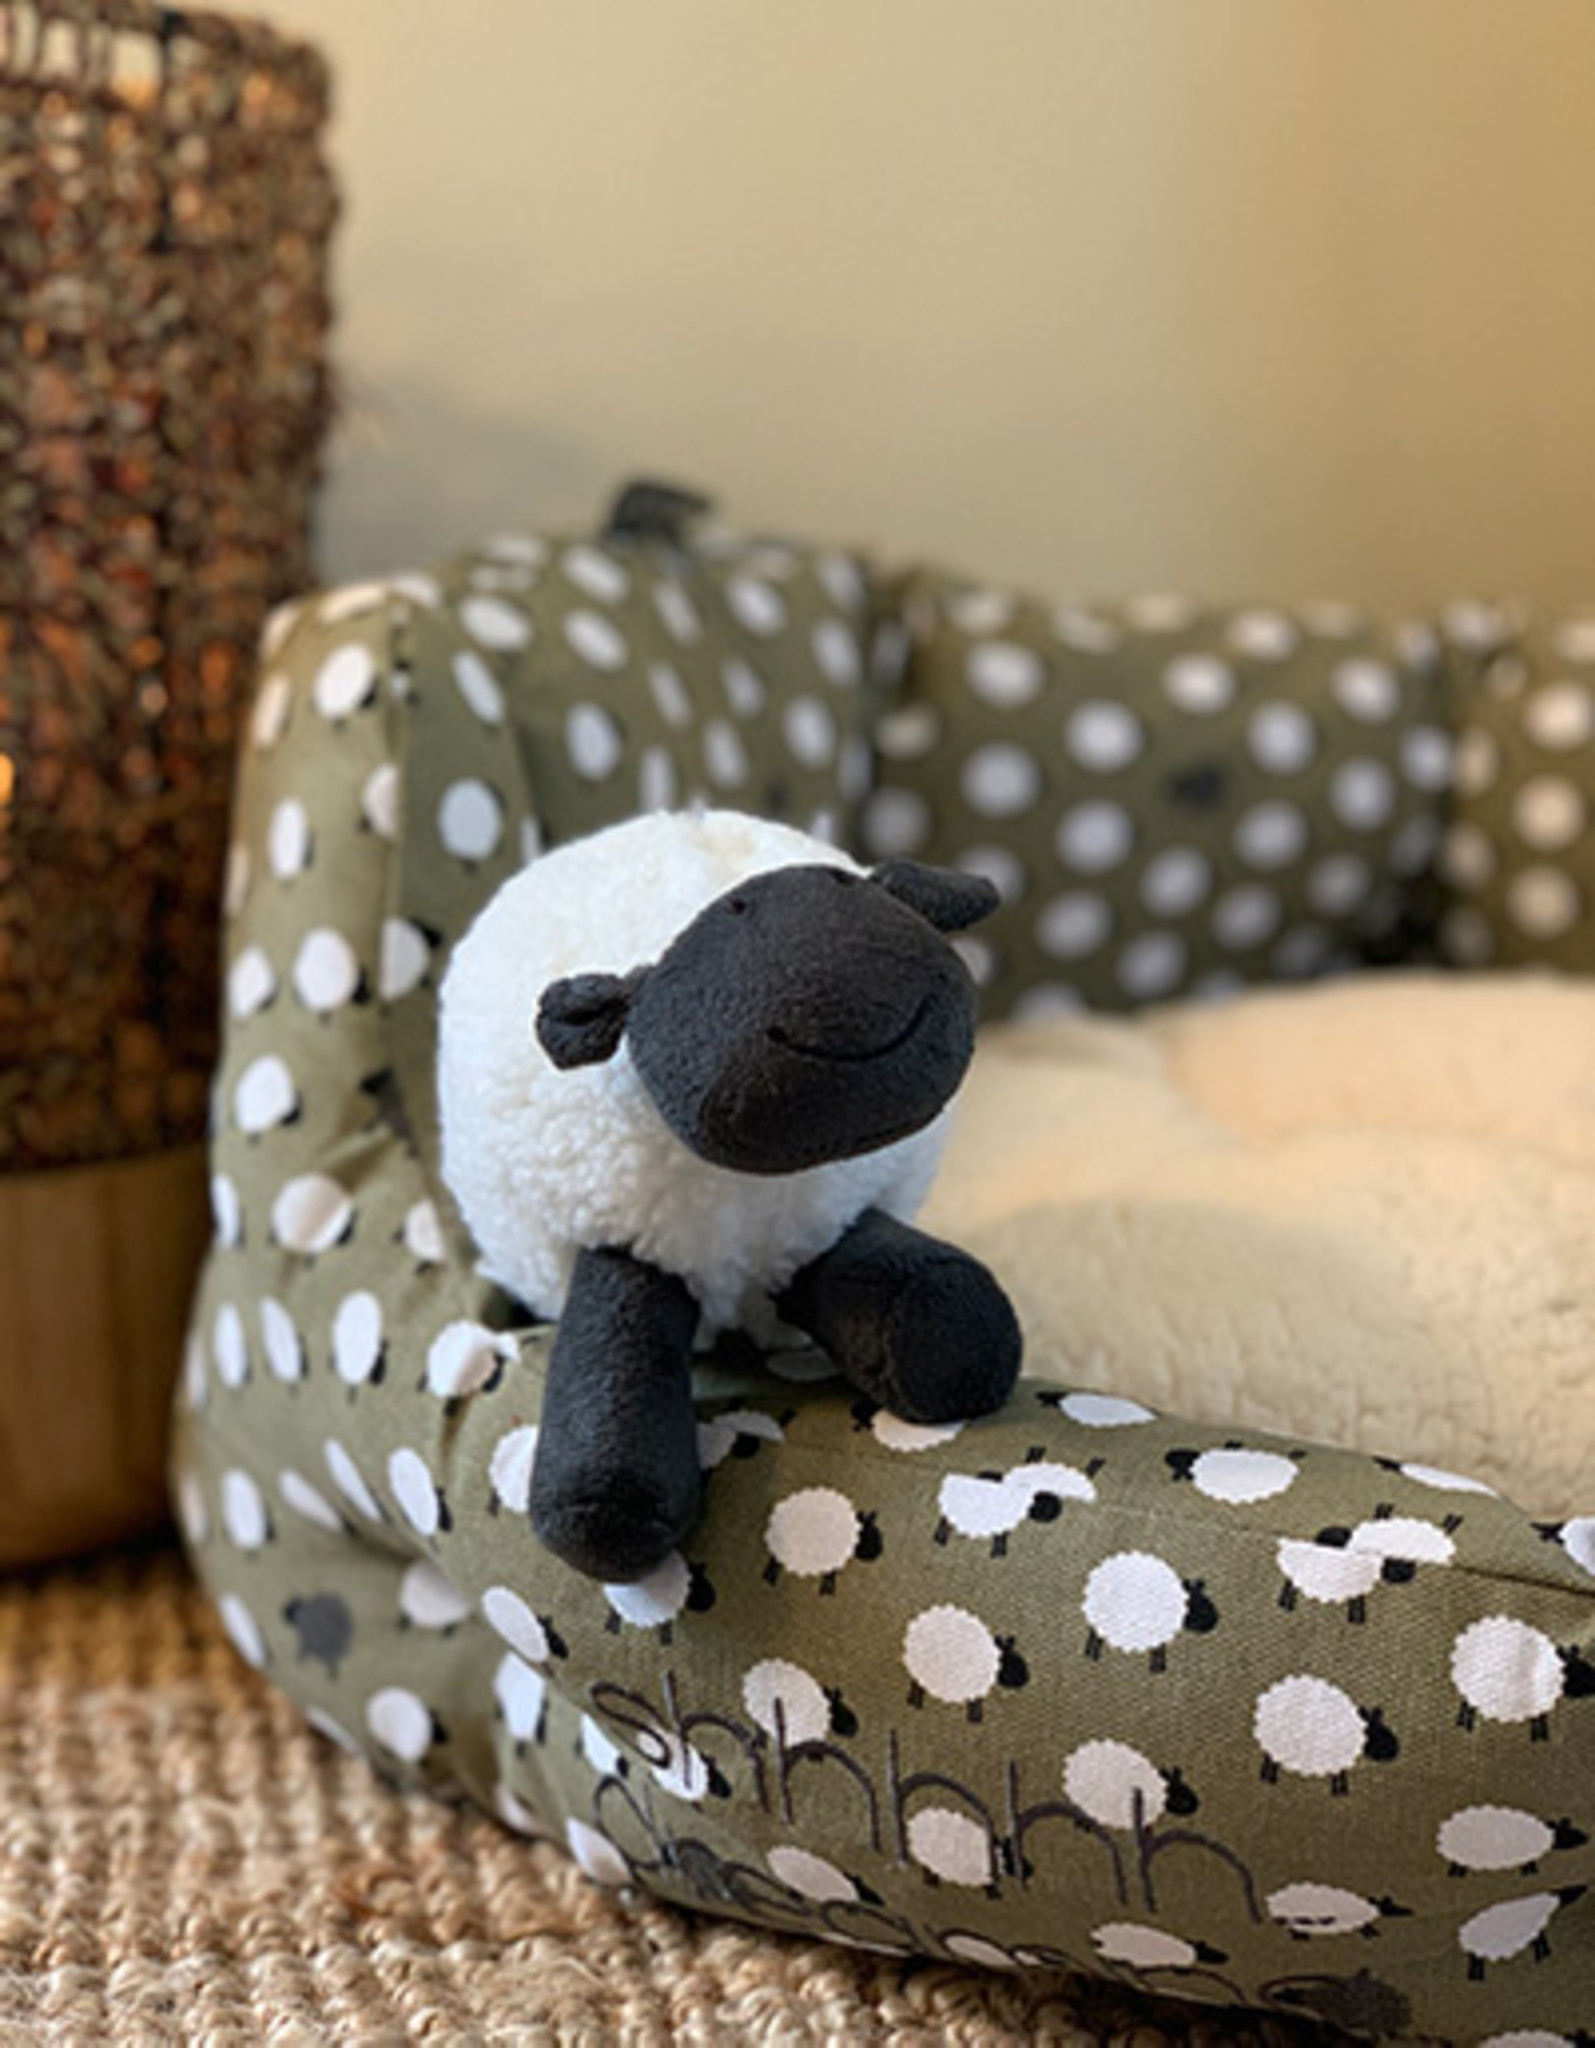 Mister Sheep